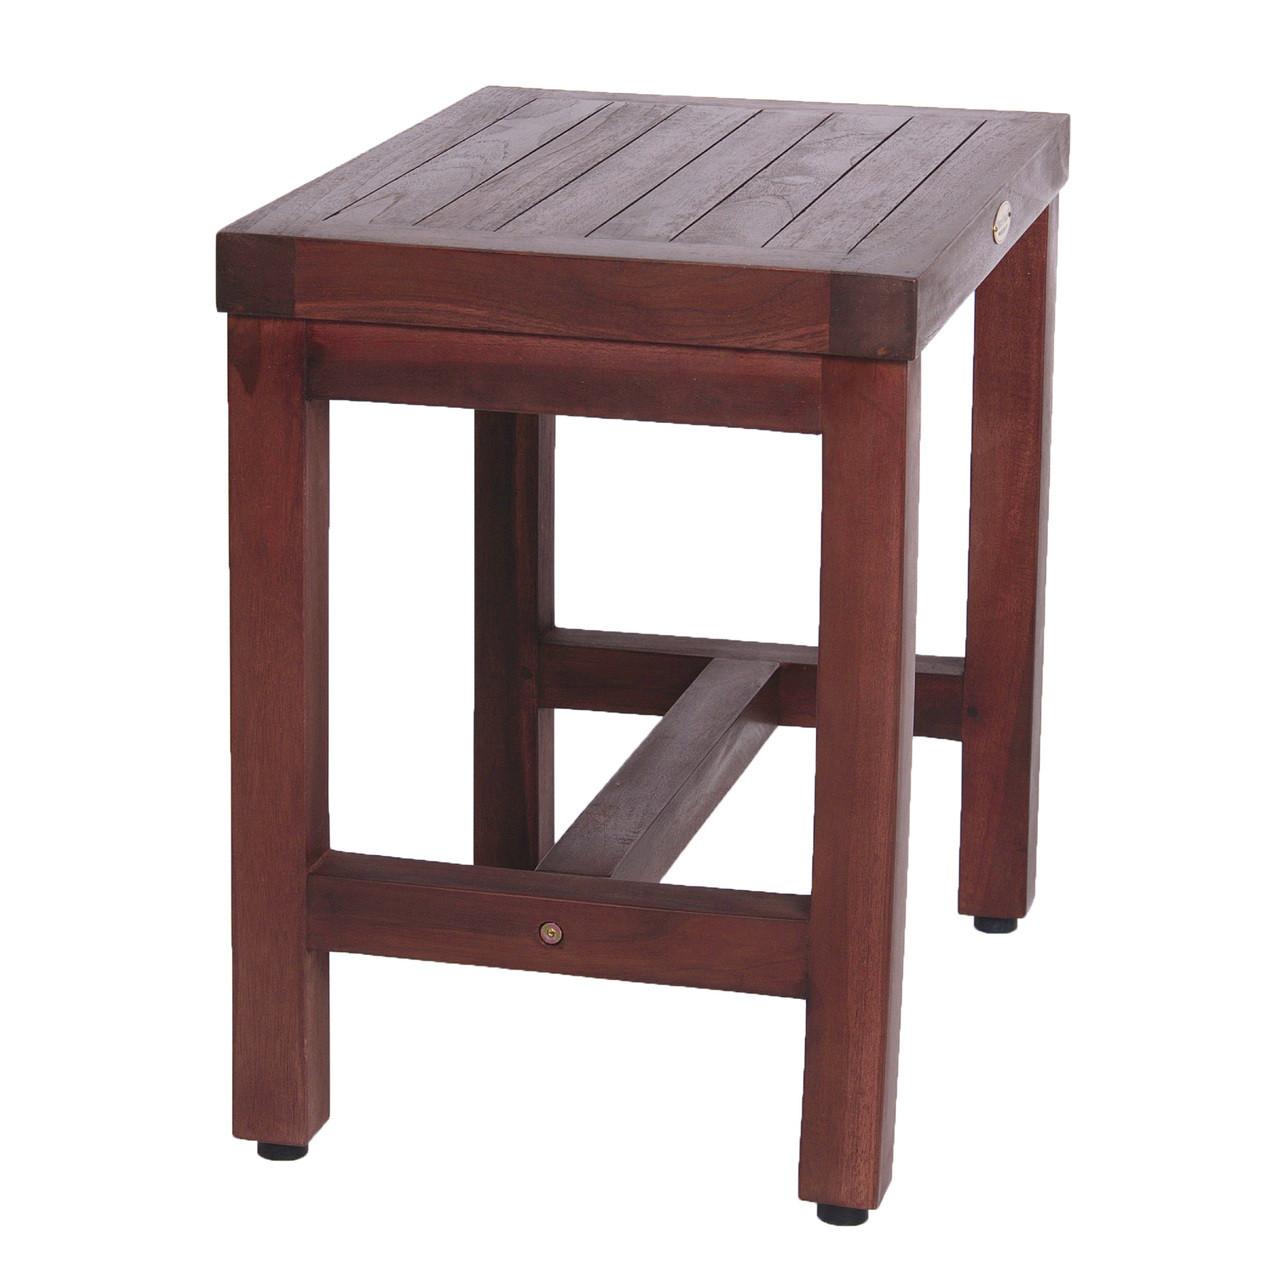 "DecoTeak Eleganto 18"" Teak Wood Shower Bench in Woodland Brown Finish"